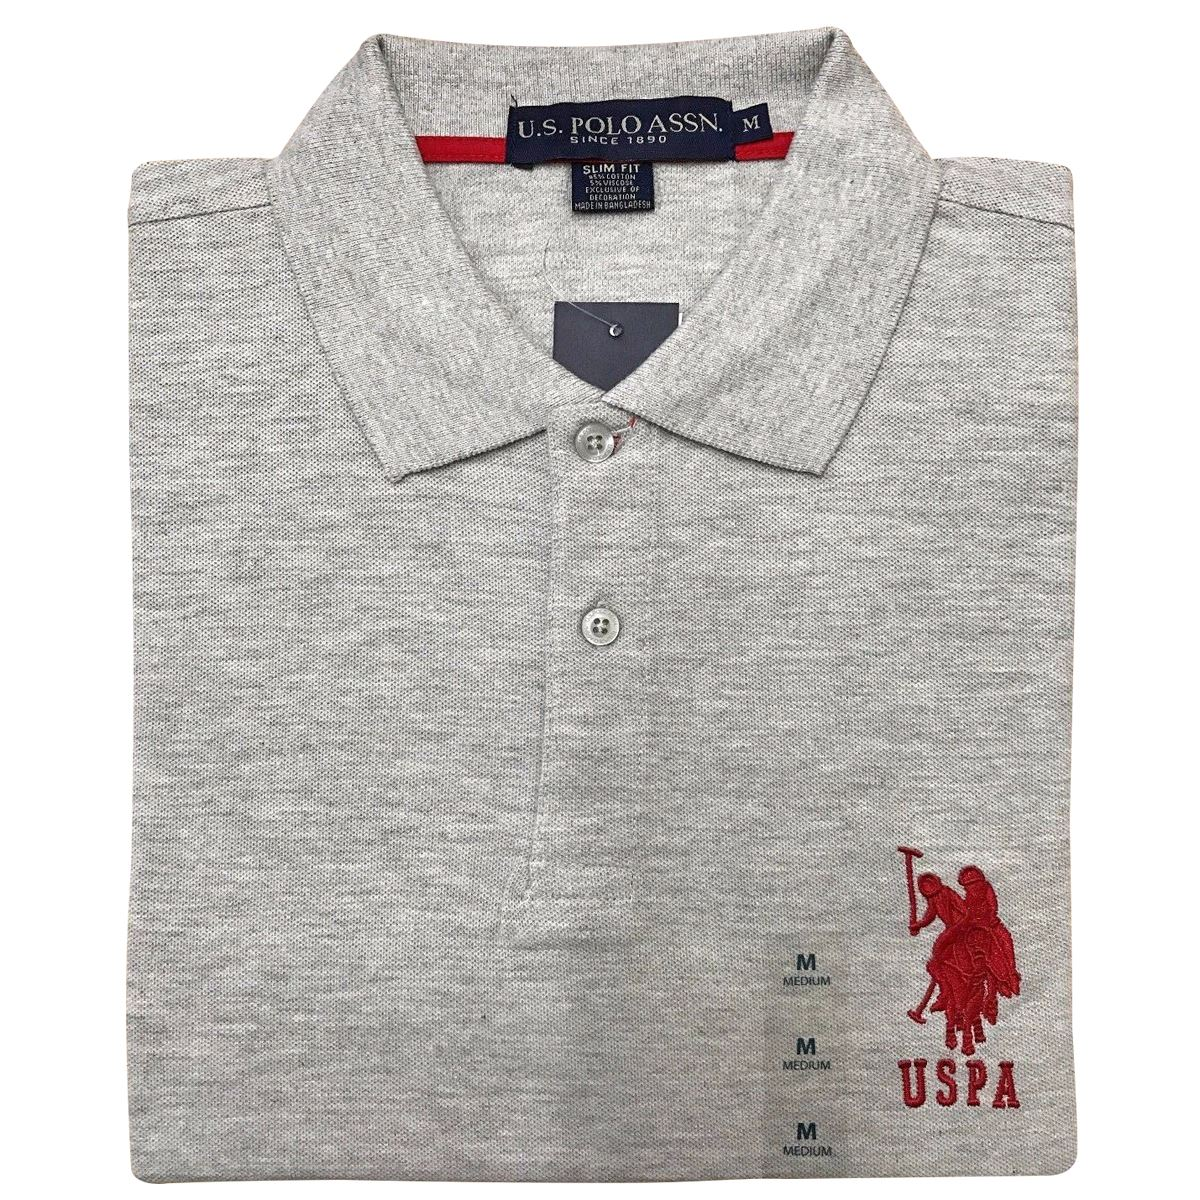 New Mens US Polo Assn Pique Tshirt Shirt Branded Top Short Sleeve - Us assn polo map